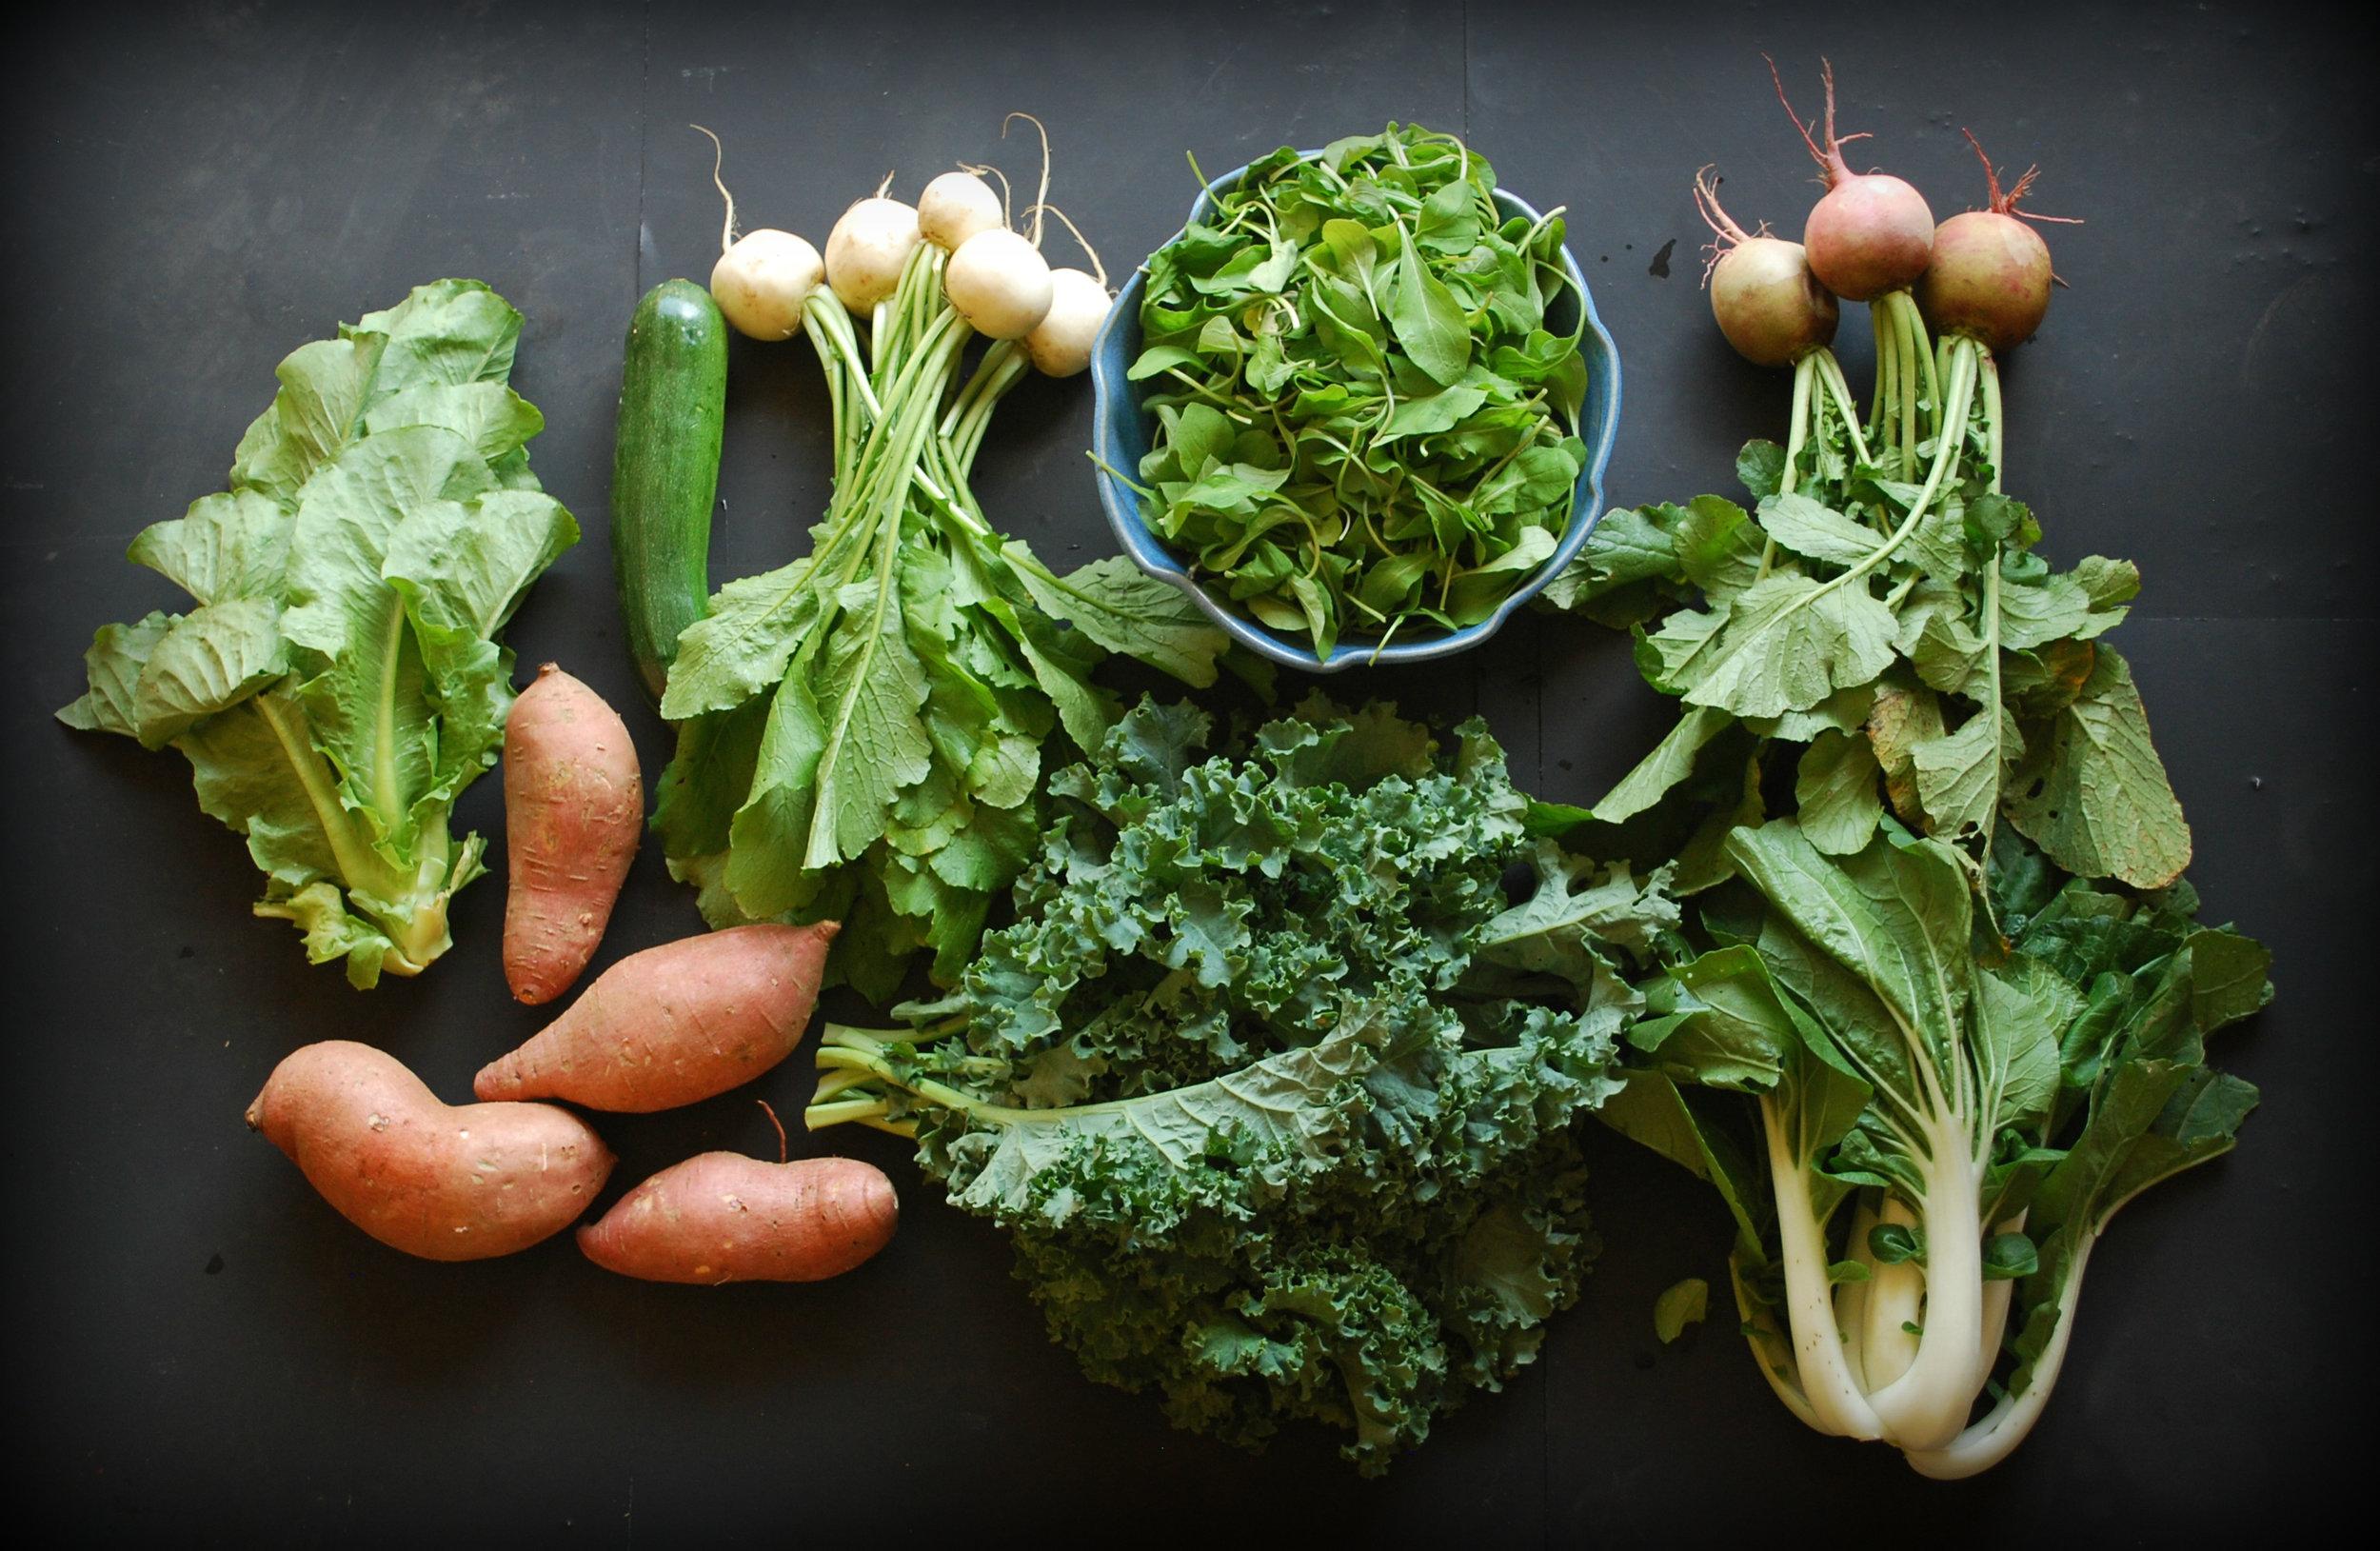 Your Fall CSA Week 1: sweet potatoes, Romaine lettuce,zucchini, salad turnips arugula, kale, Bok Choy, and watermelon radishes.